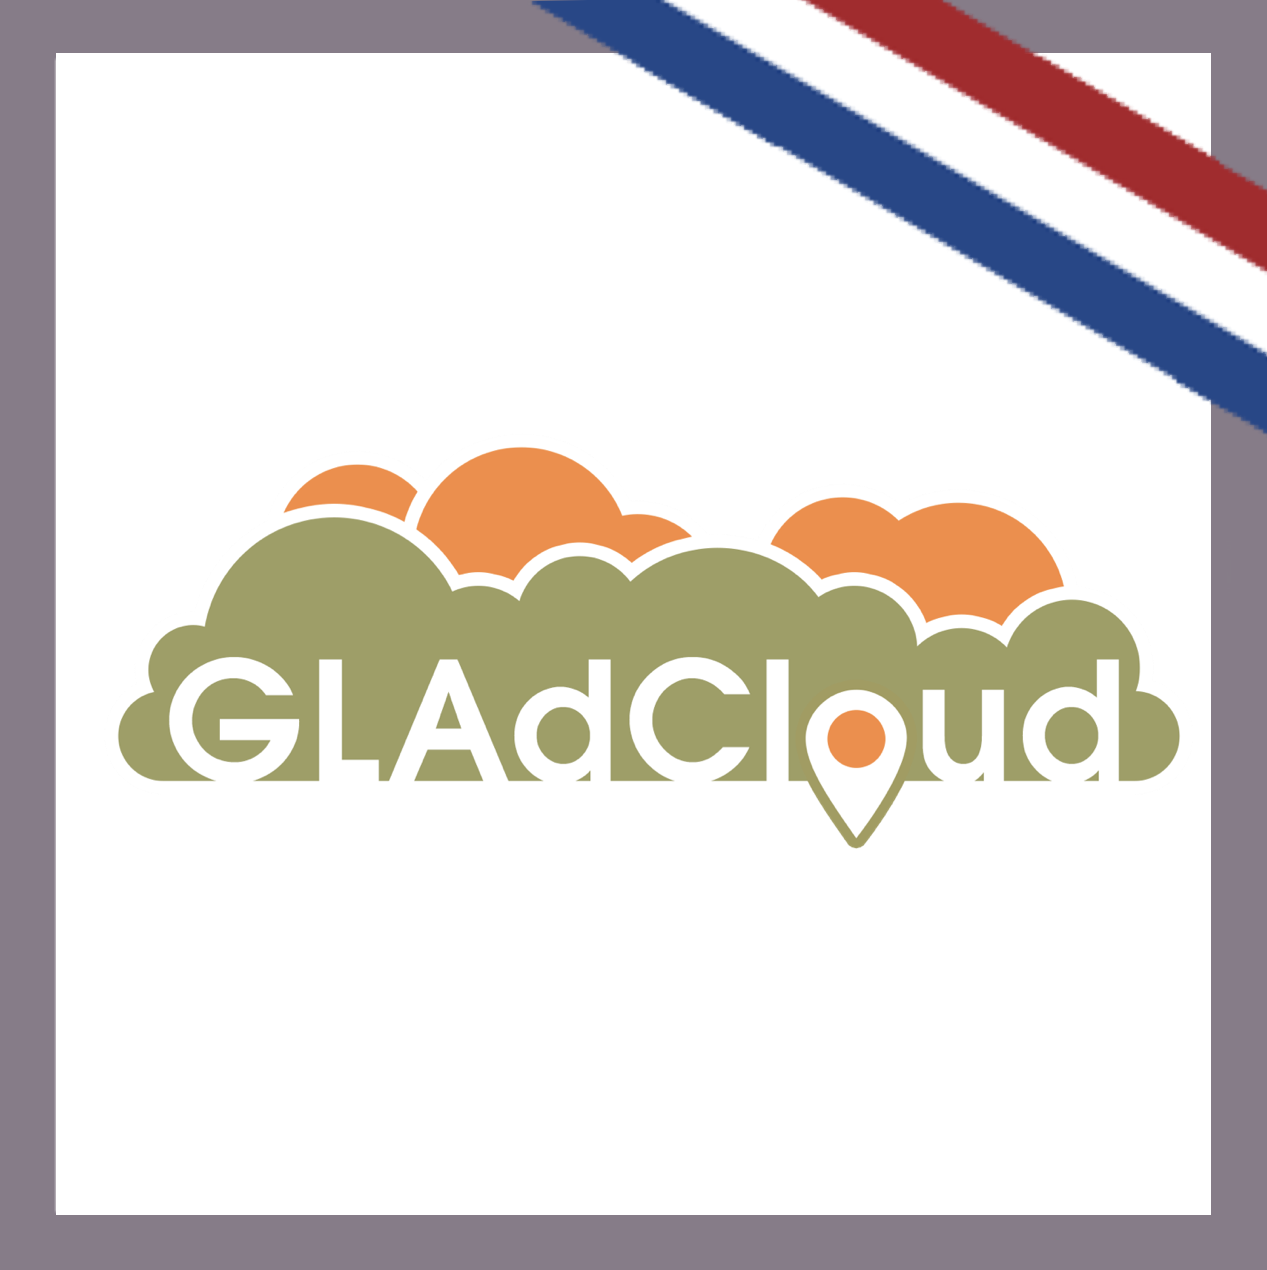 gladcloud site.png